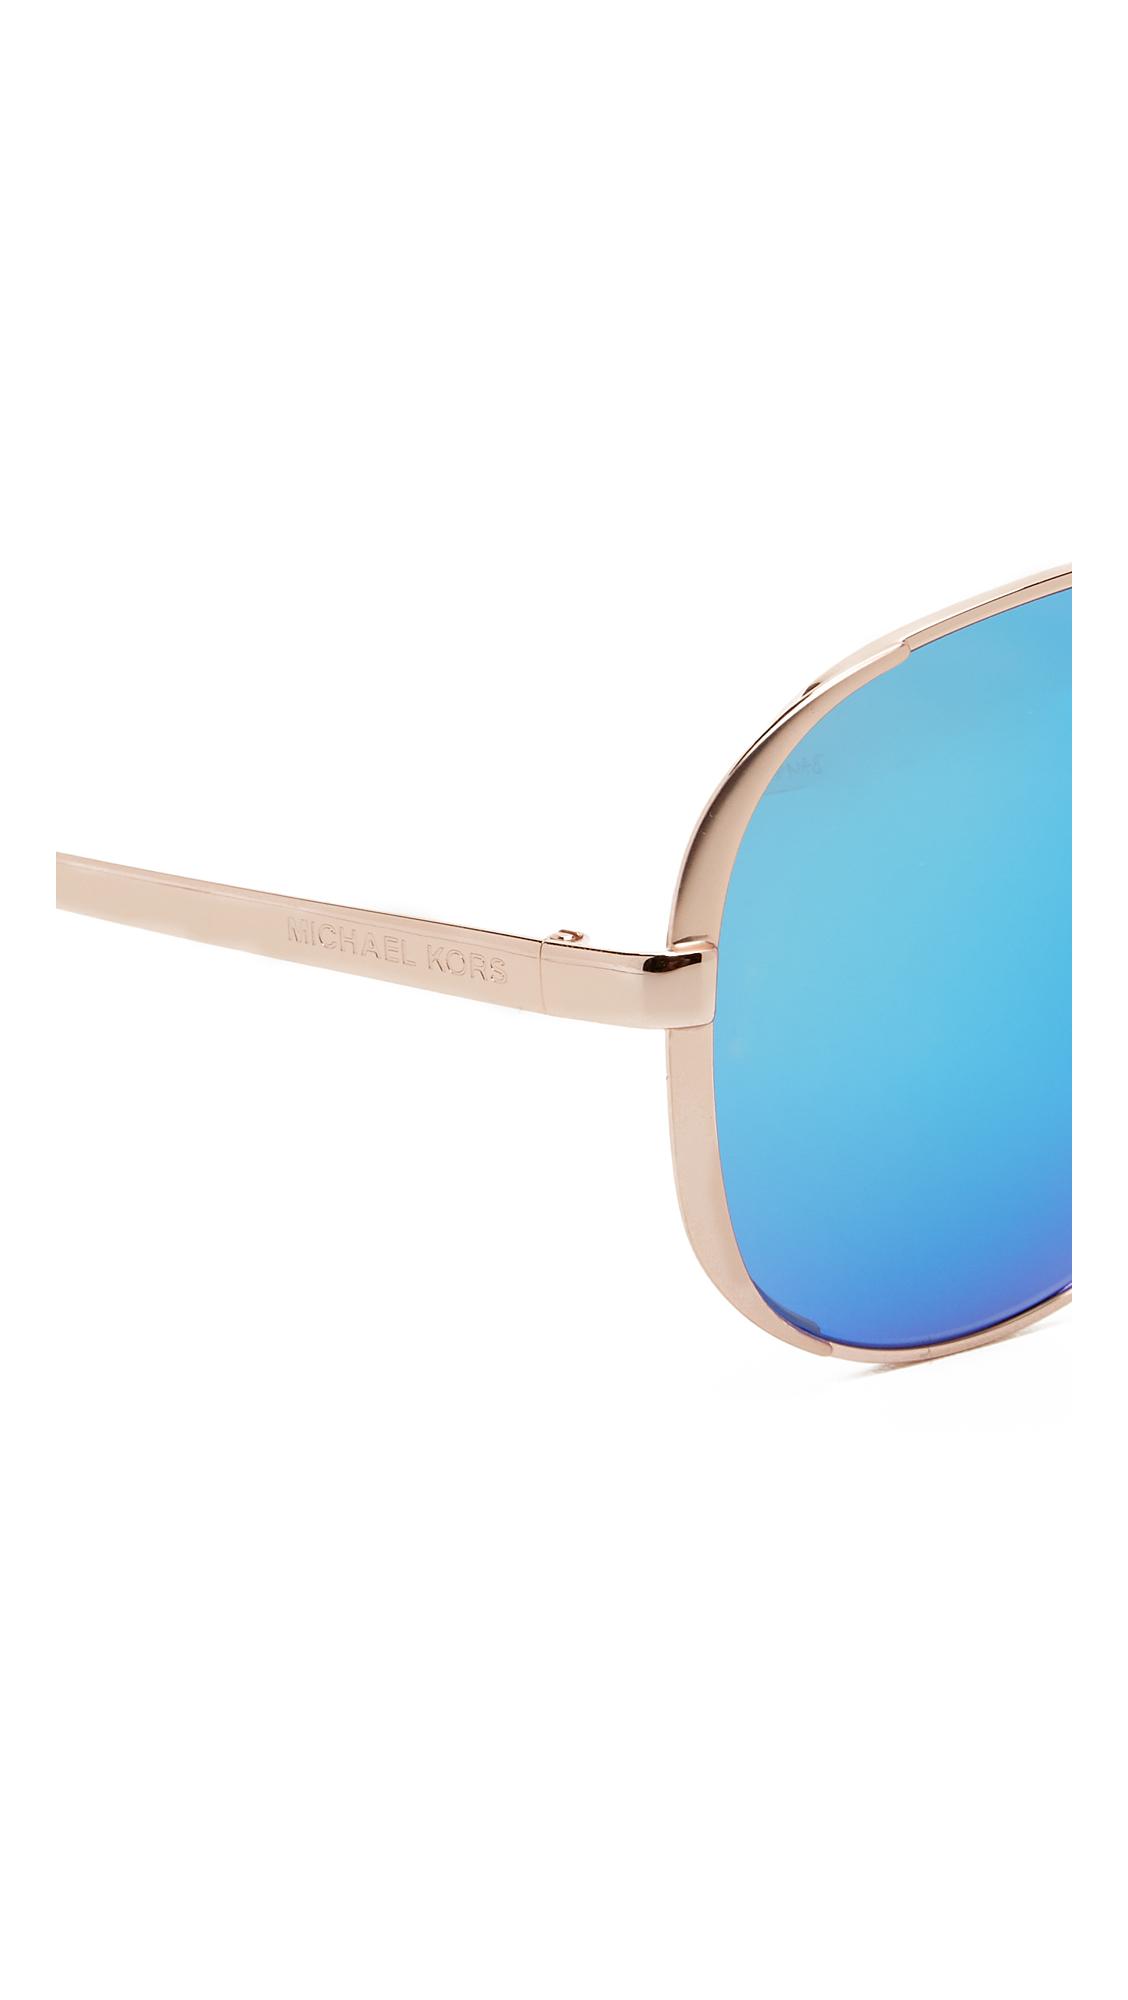 45eb381ffac0 49802 45b11; netherlands michael kors chelsea polarized sunglasses in metallic  lyst 2303f f0272